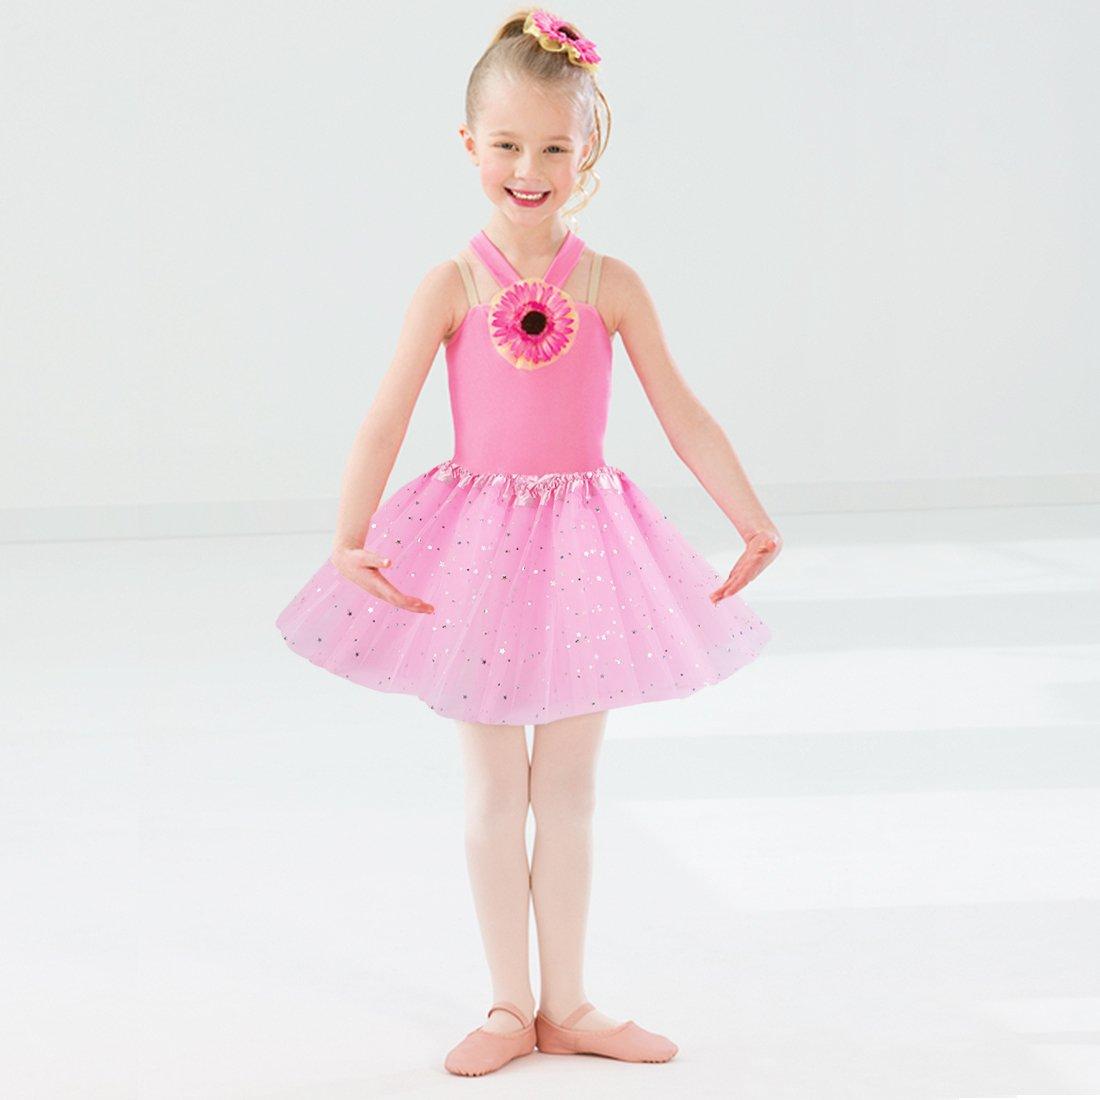 kilofly 6pc Girls Ballet Tutu Kids Birthday Princess Party Favor Dress Skirt Set by kilofly (Image #4)